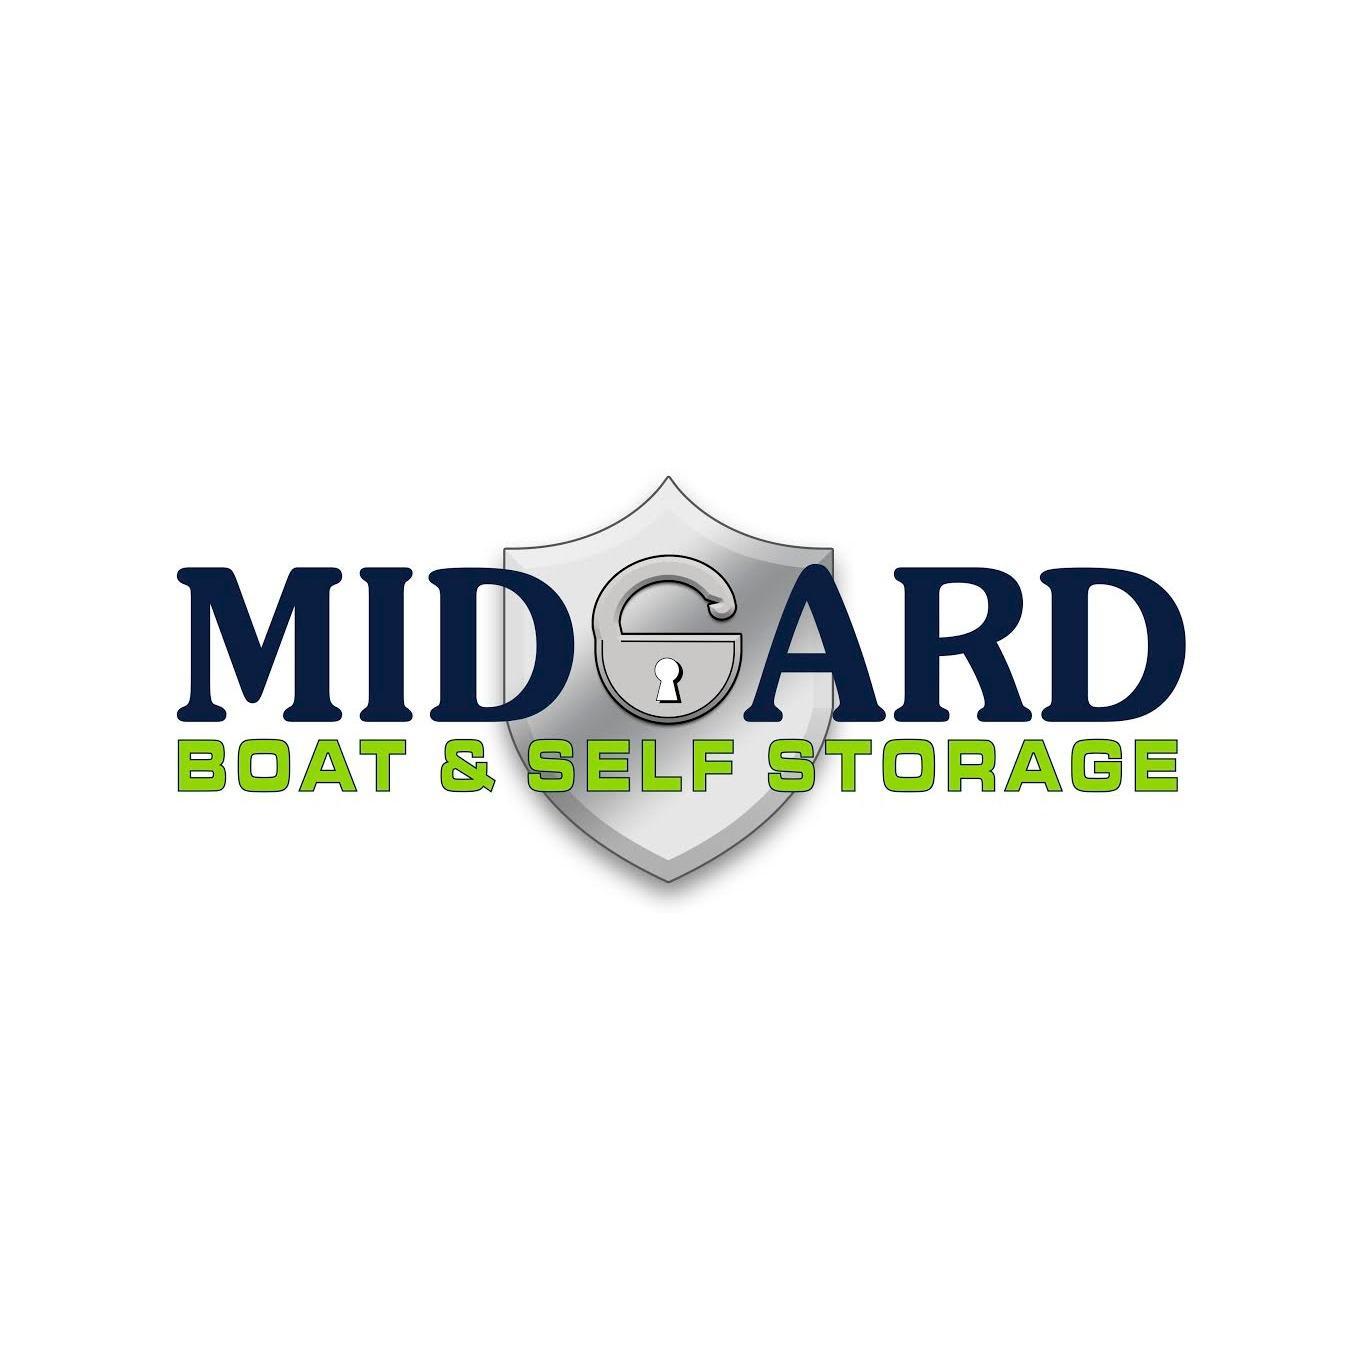 Midgard Boat & Self Storage